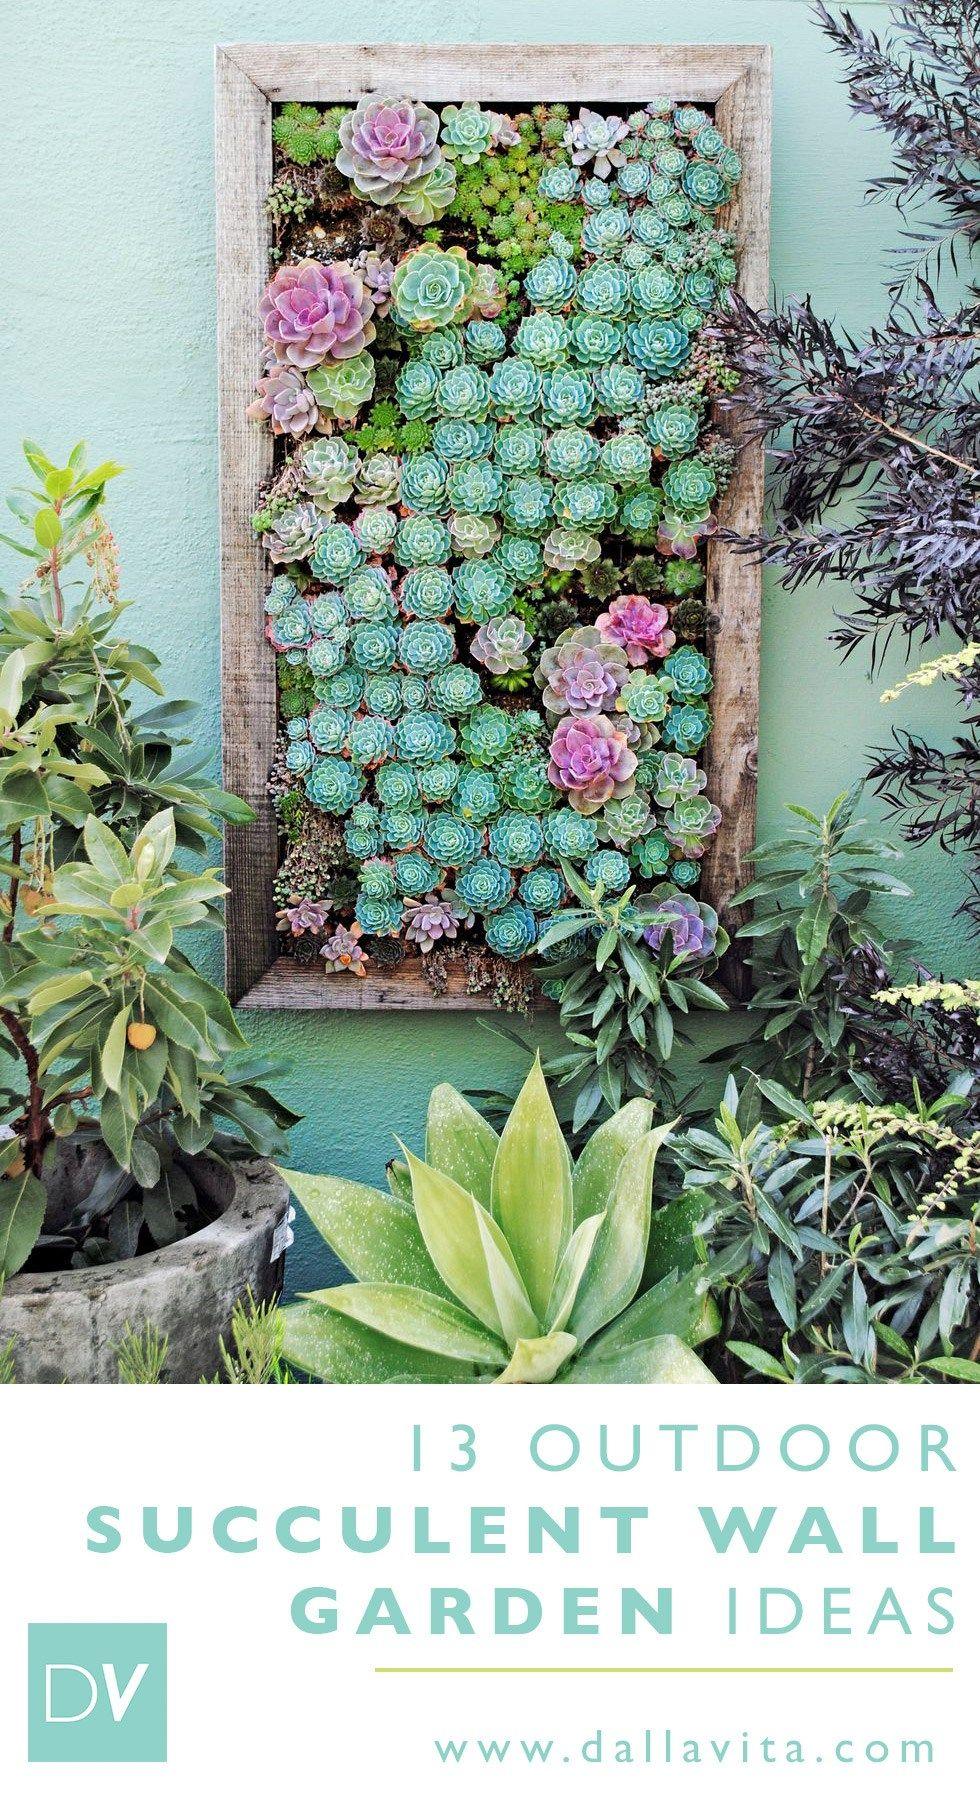 13 Outdoor Succulent Wall Garden Ideas In 2020 Vertical Garden